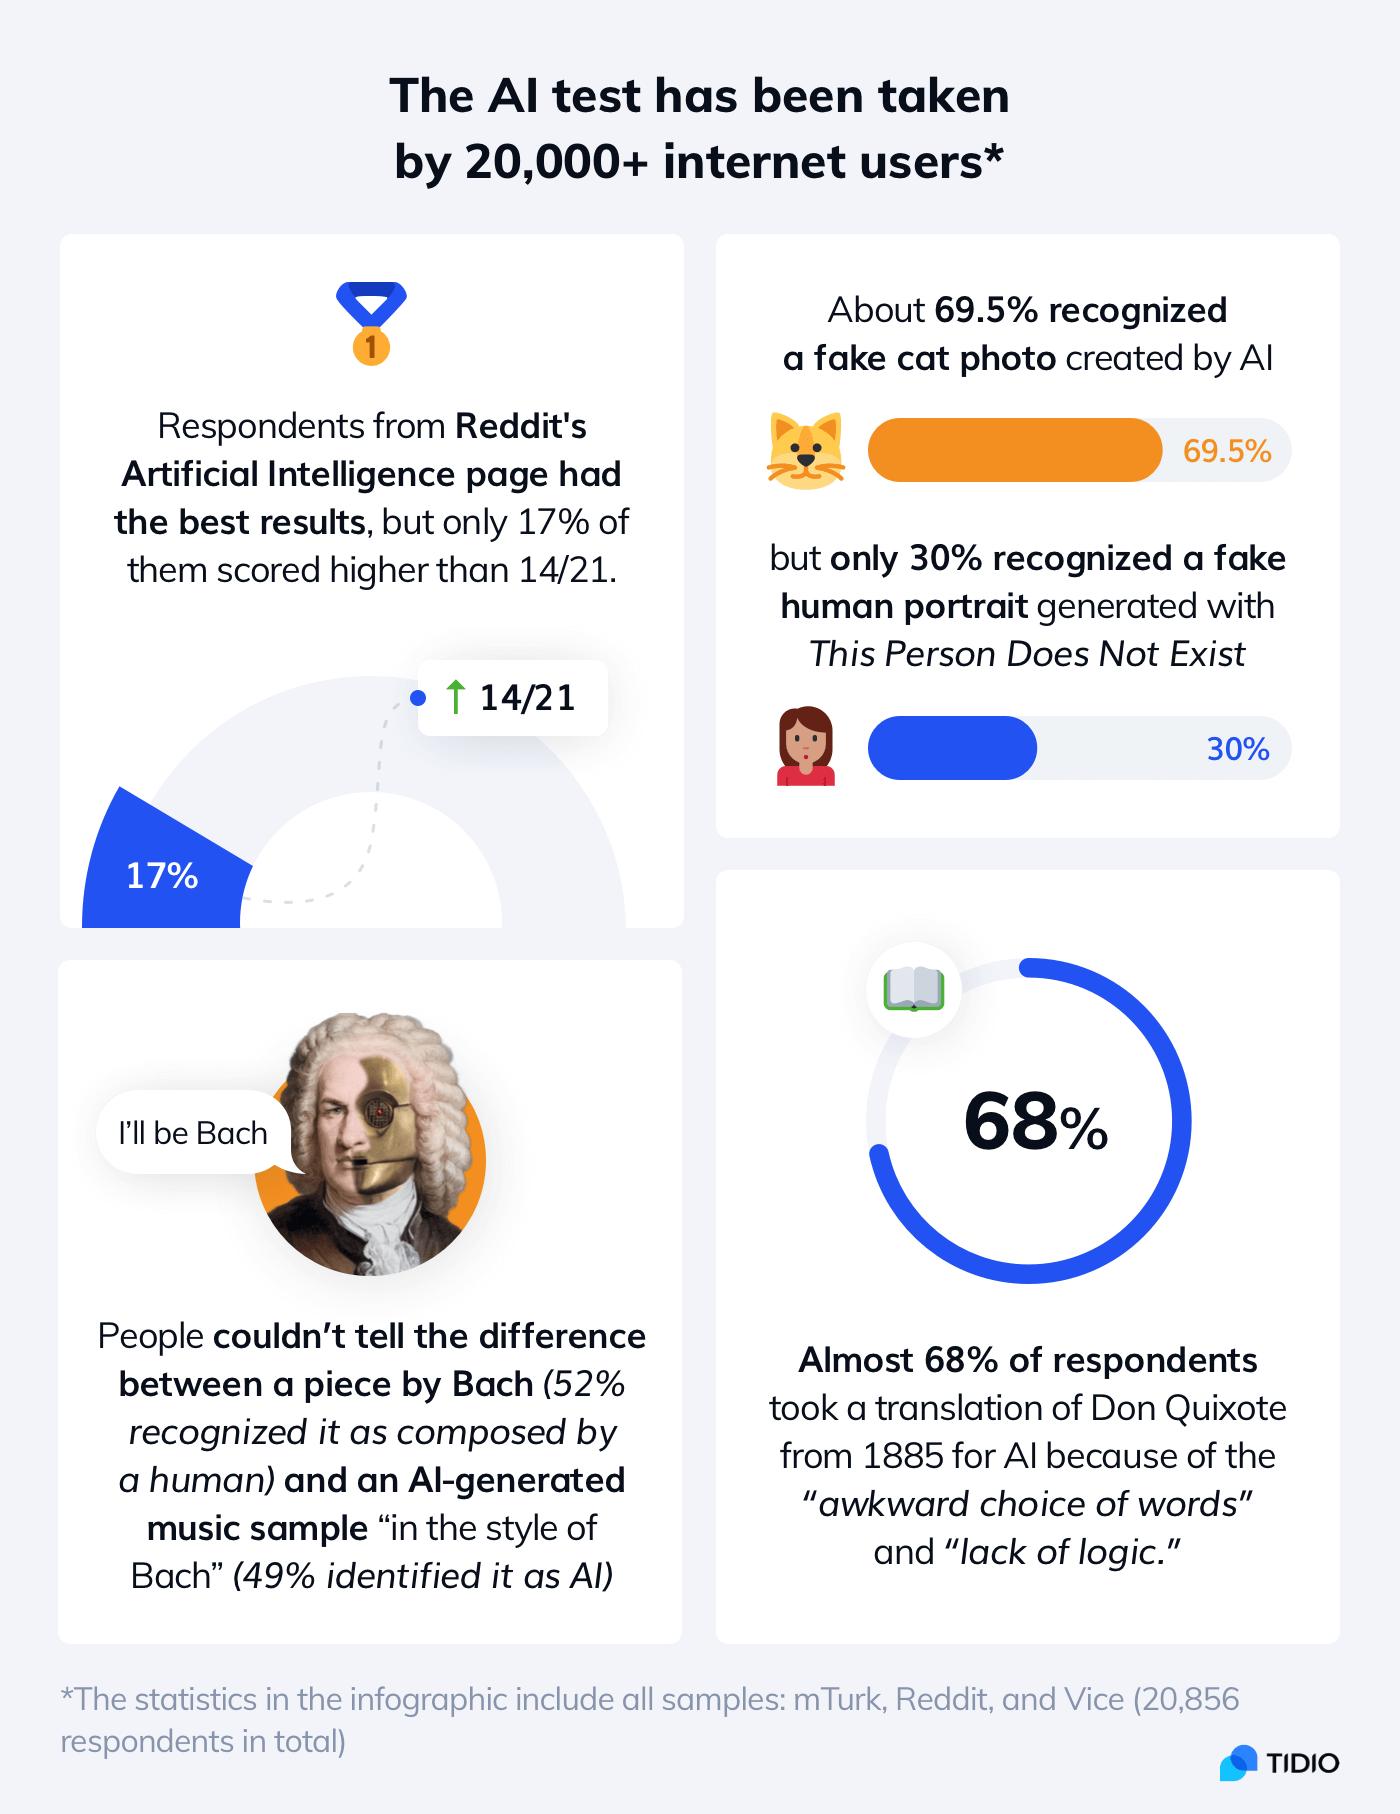 Human vs AI statistics